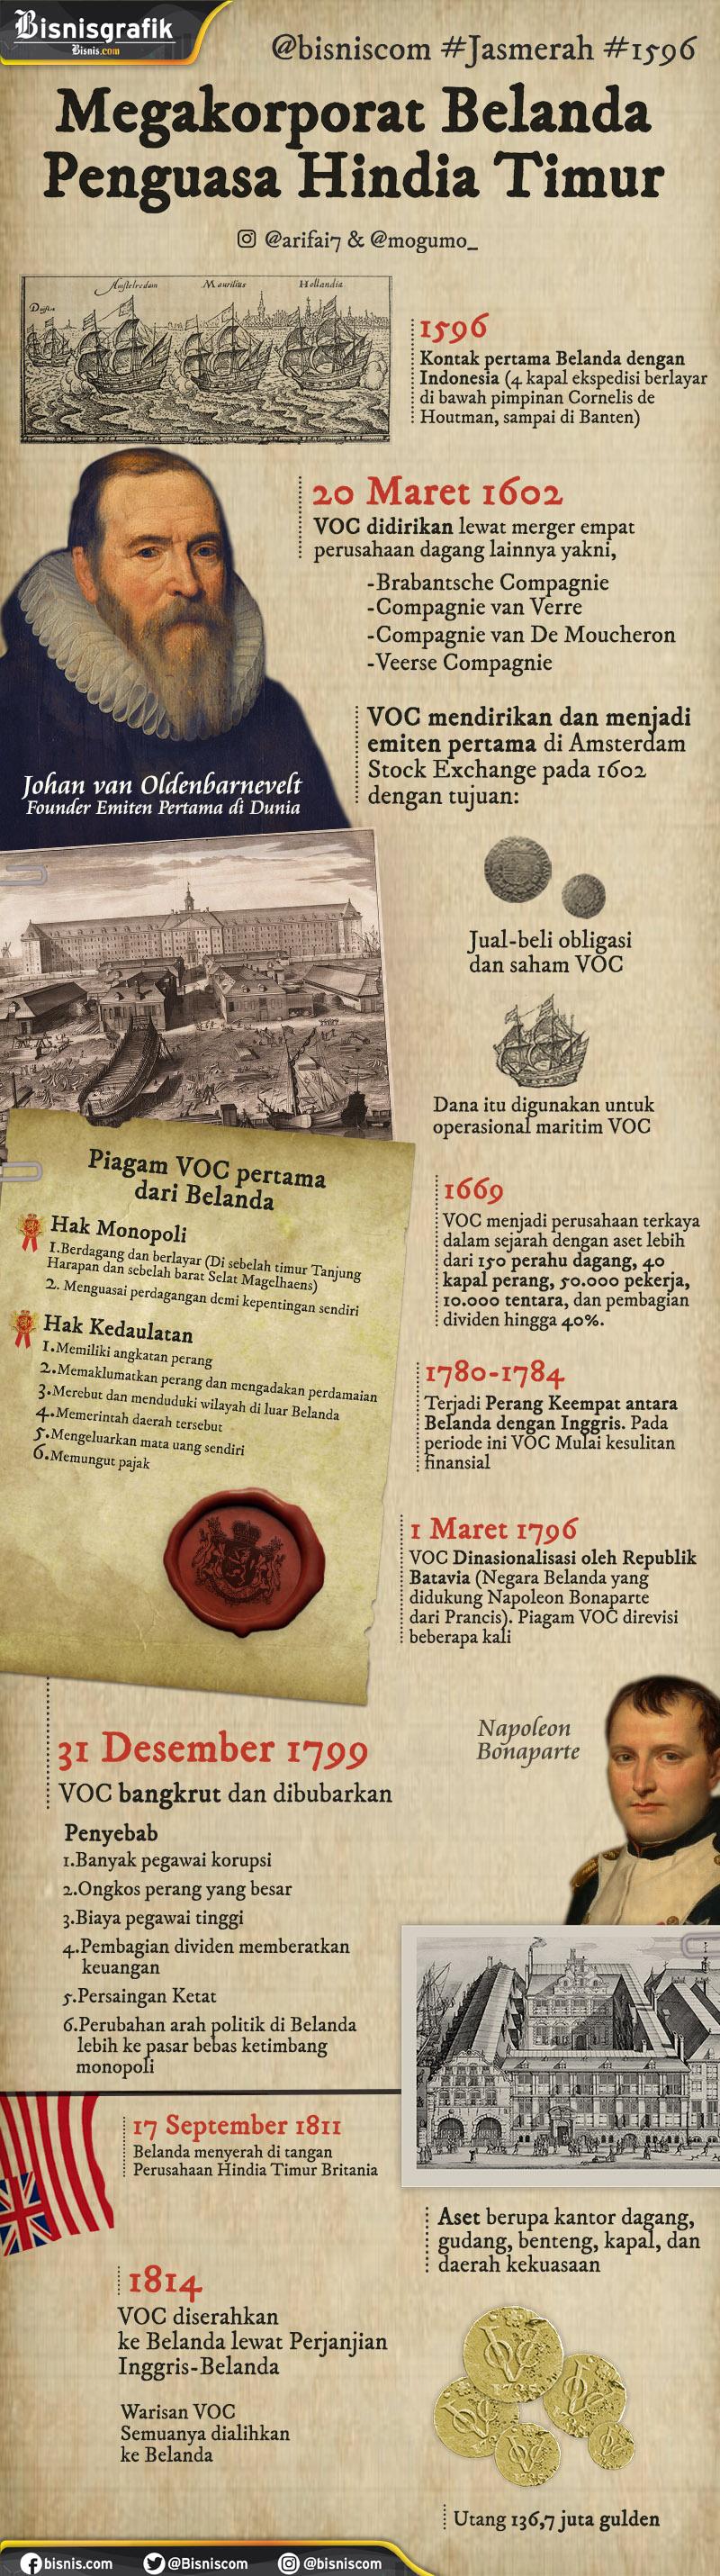 Sejarah Berdirinya VOC Halaman all - cryptonews.id